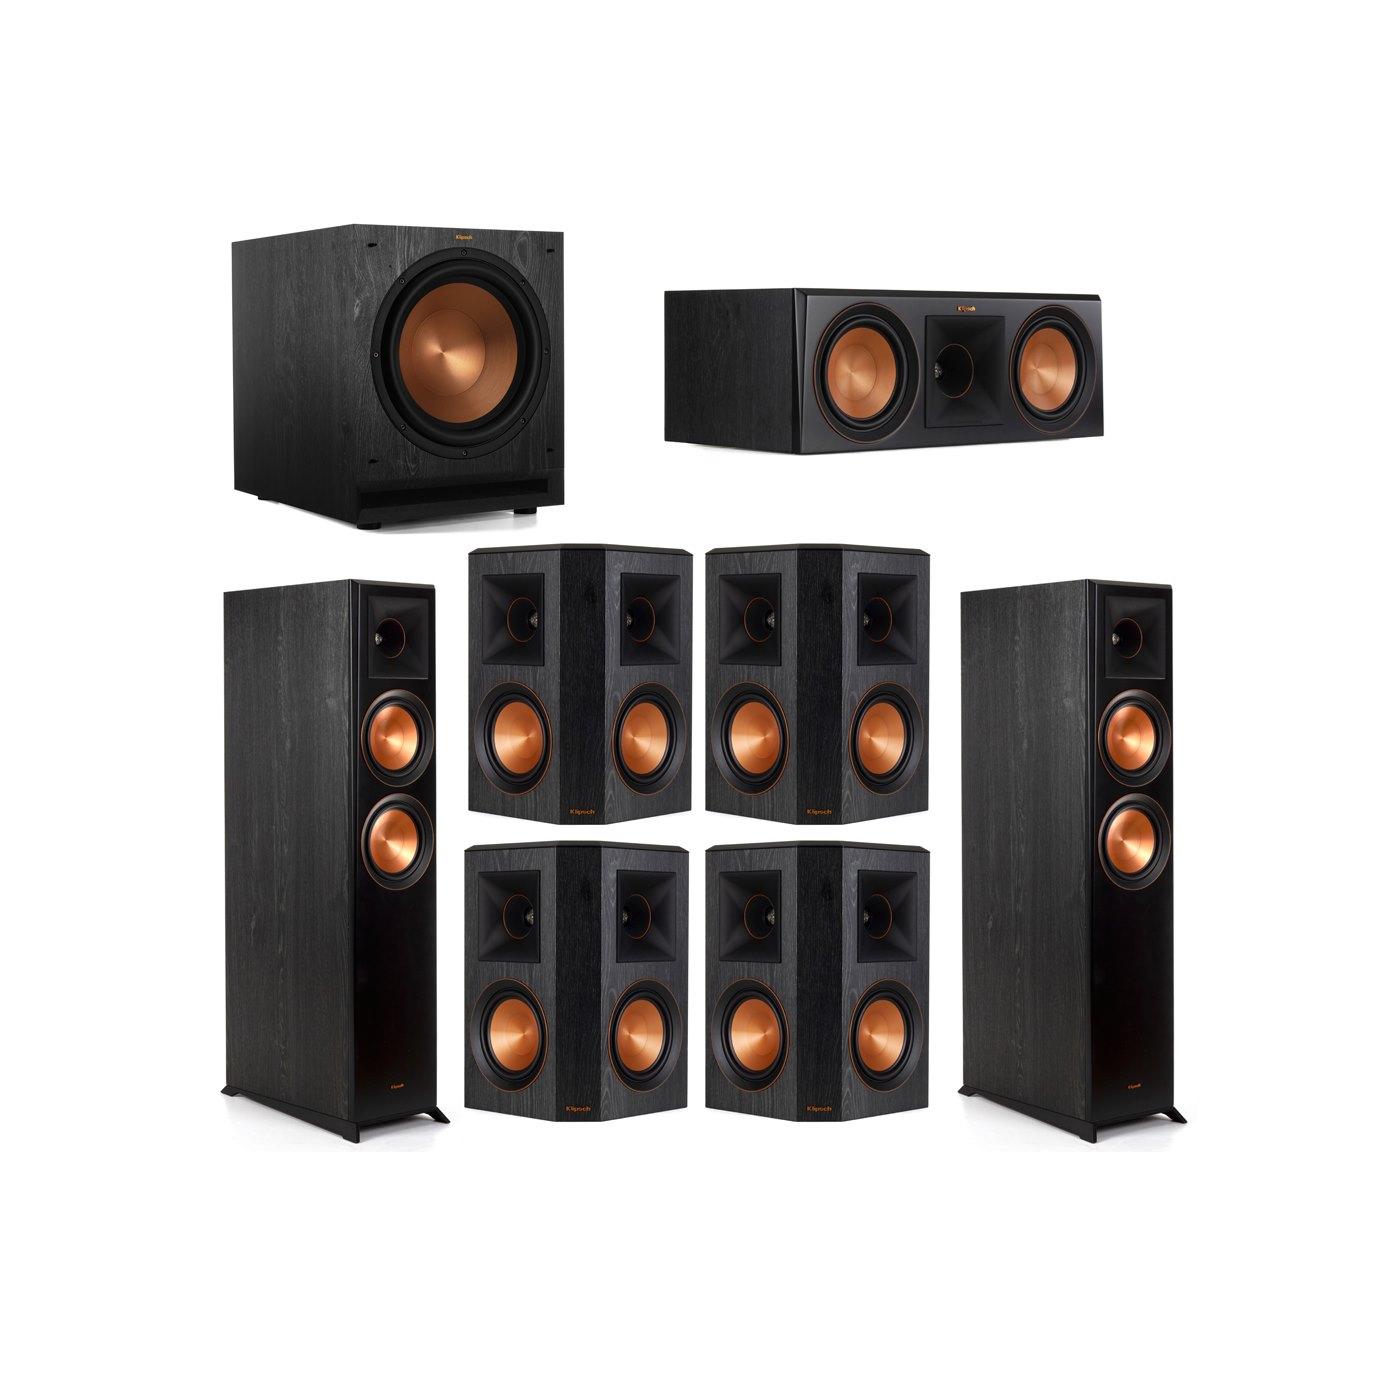 Klipsch 7.1 System with 2 RP-6000F Floorstanding Speakers, 1 Klipsch RP-600C Center Speaker, 4 Klipsch RP-502S Surround Speakers, 1 Klipsch SPL-120 Subwoofer